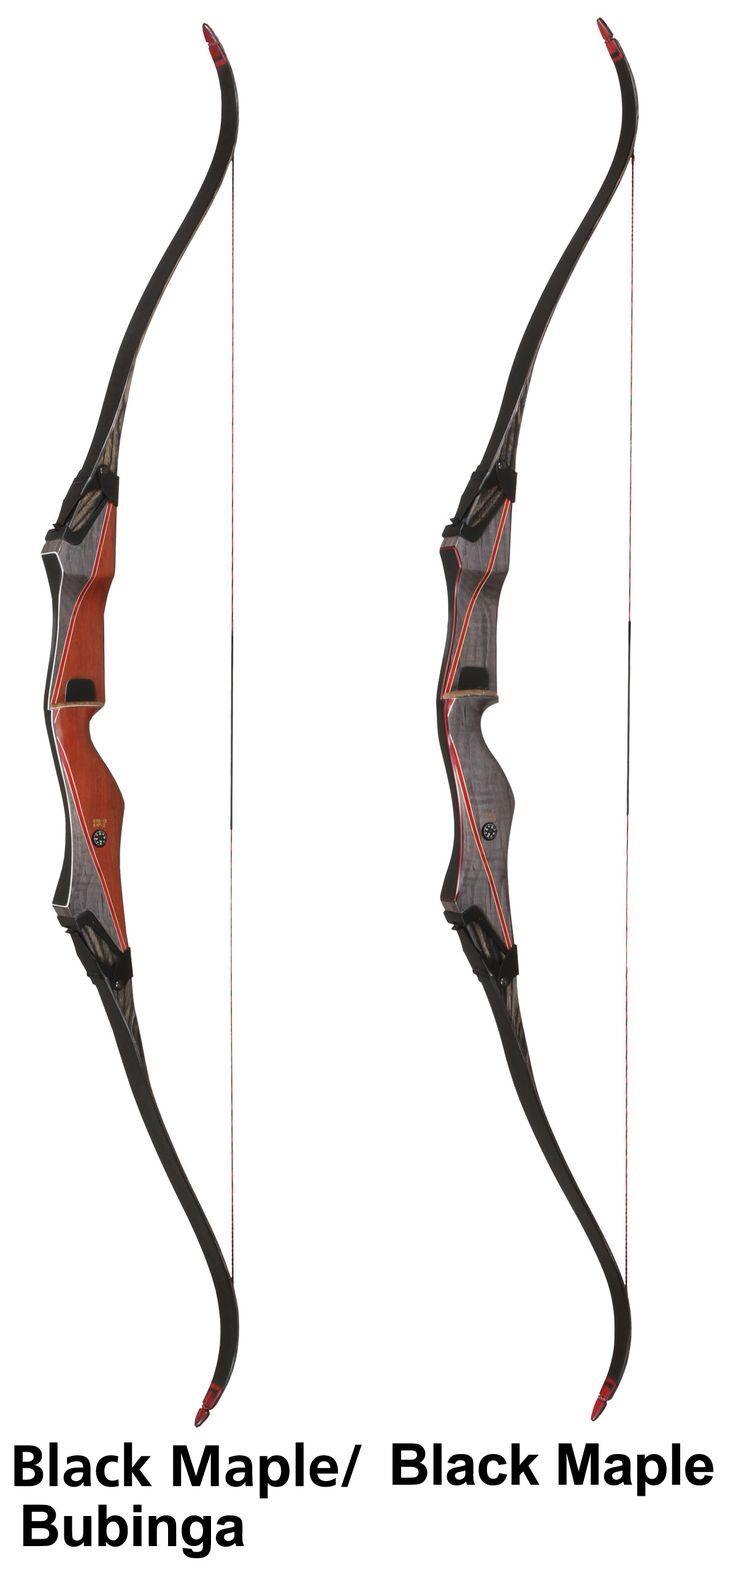 3Rivers Archery: item = Bear Takedown Recurve